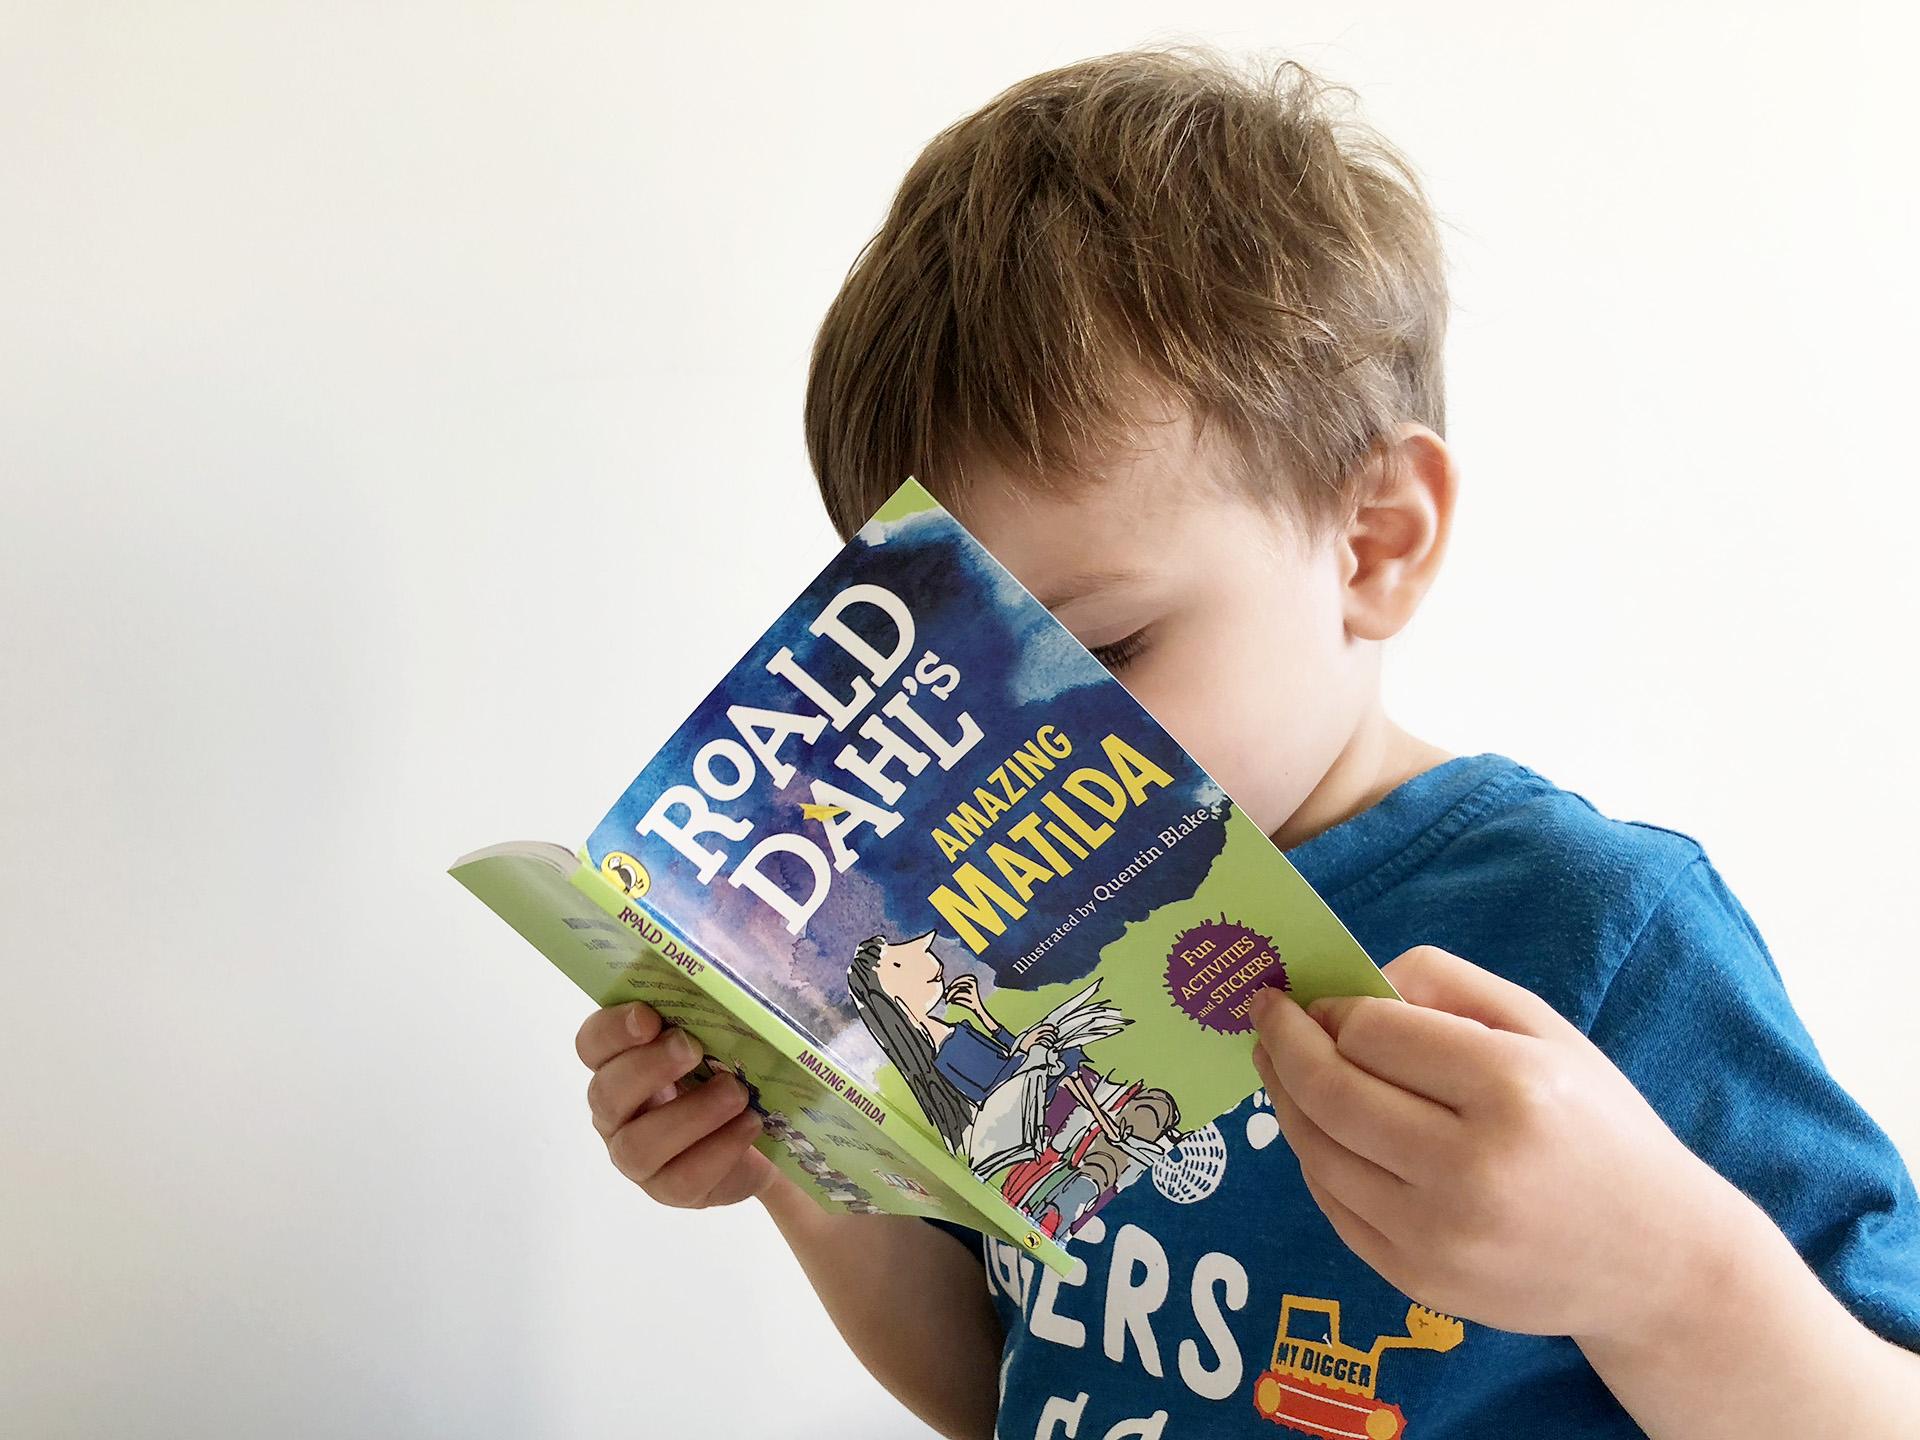 McDonald's Happy Readers campaign - Roald Dahl